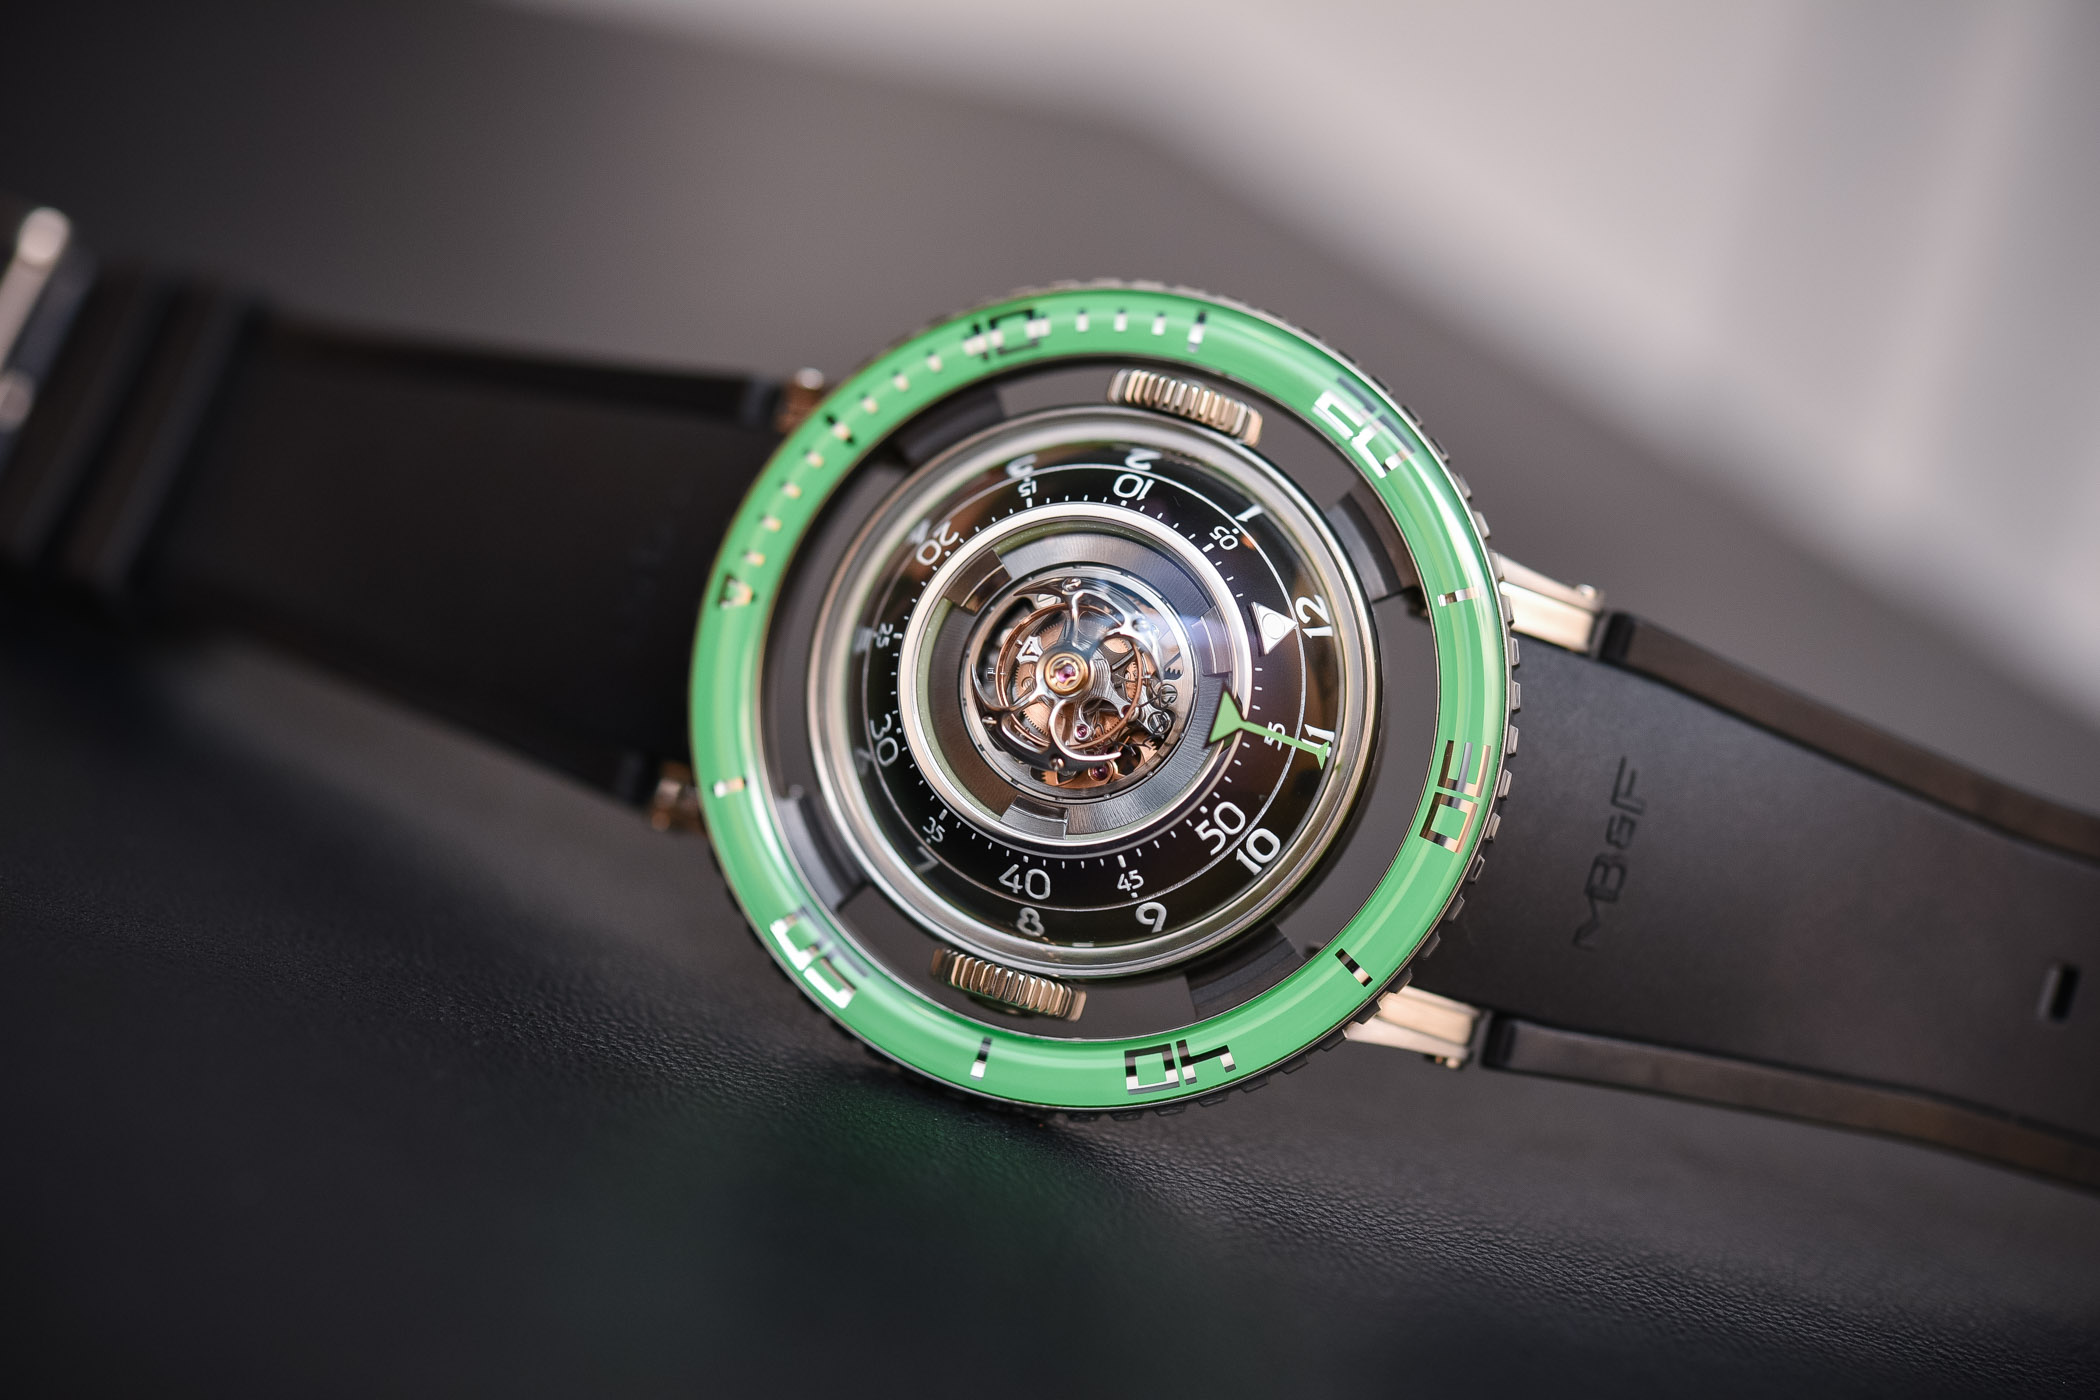 MBandF HM7 Aquapod Ti Green